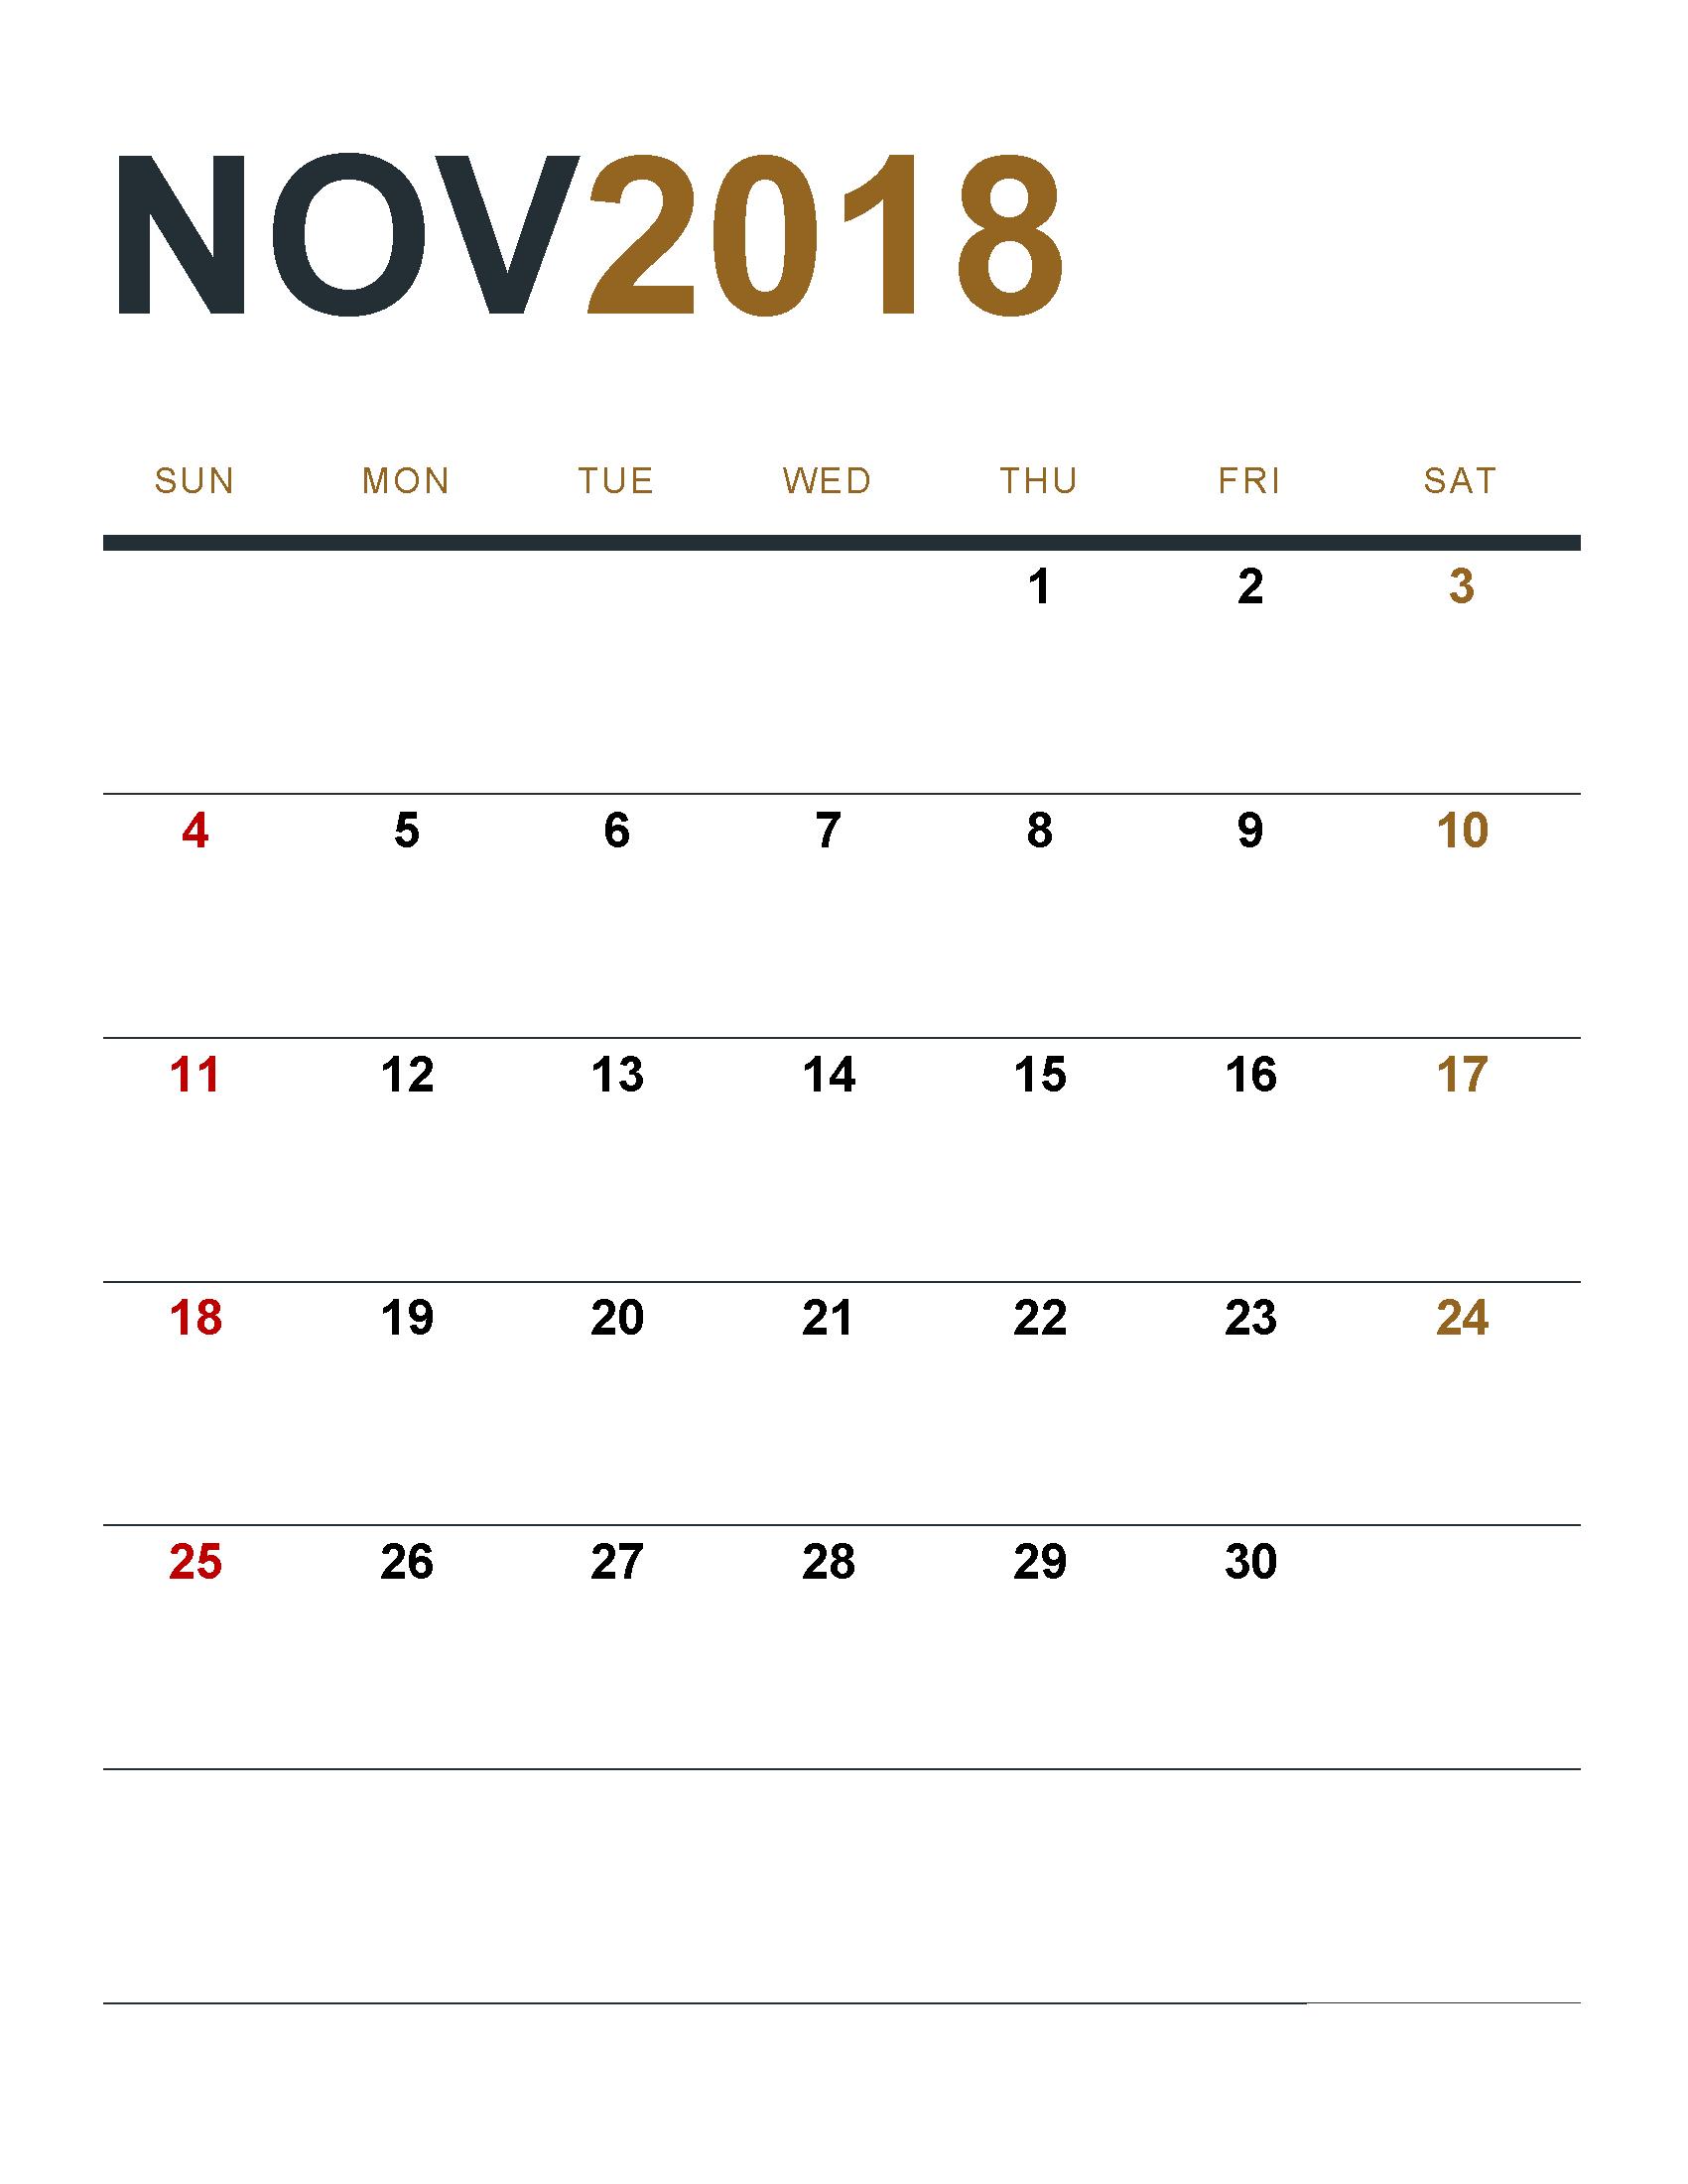 Print November 2018 Calendar Vertical